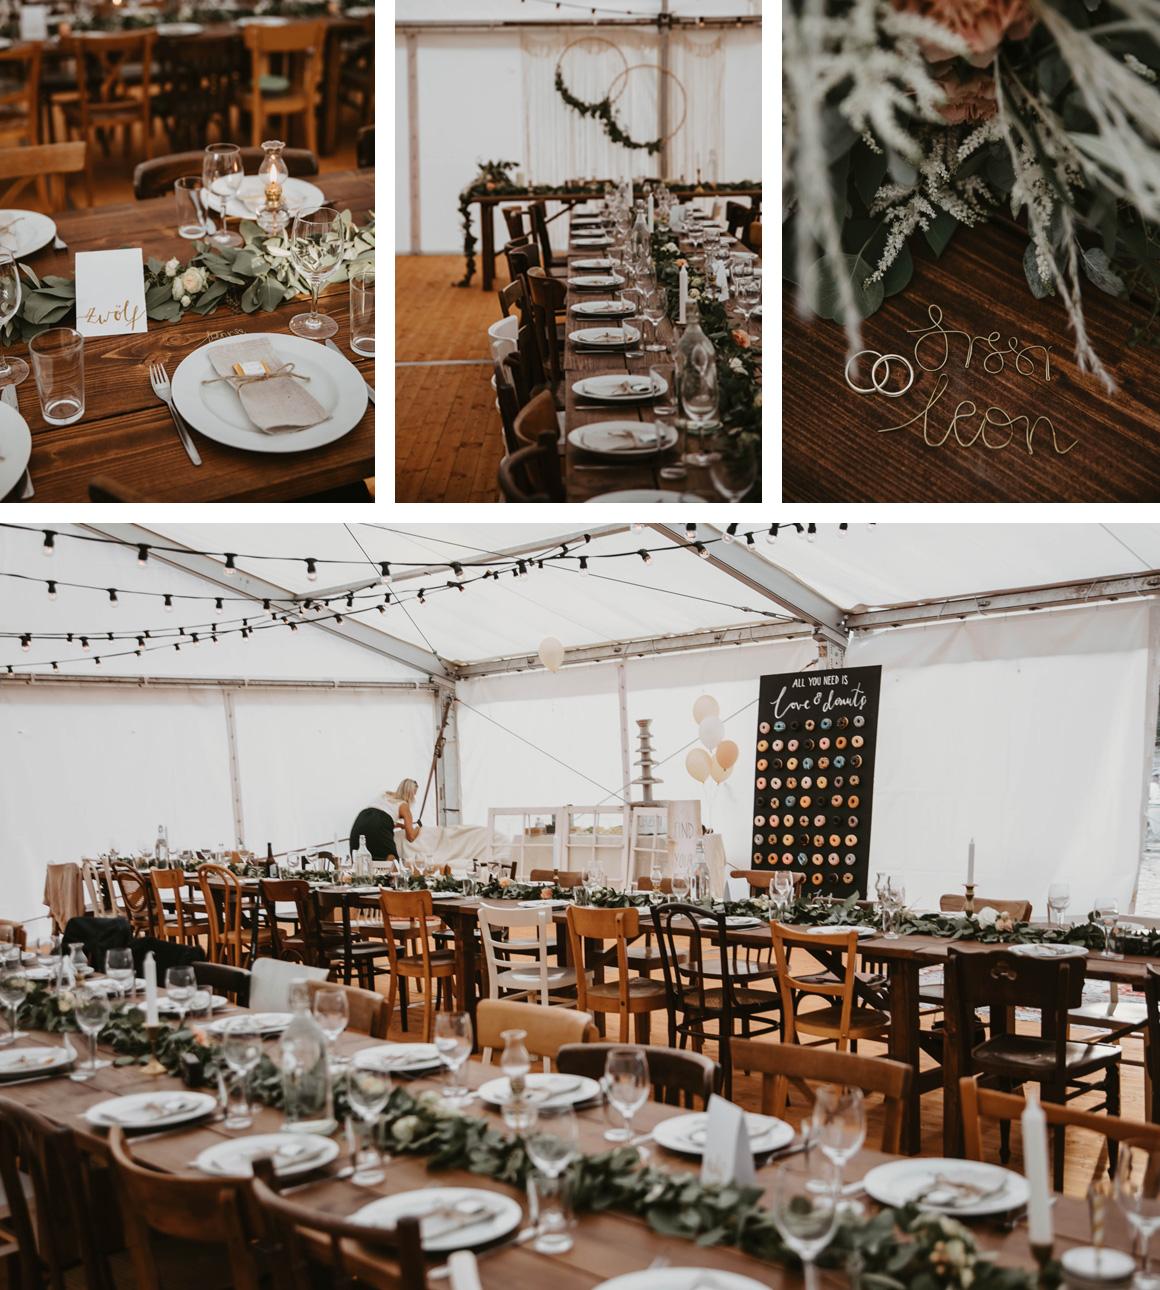 Jutta Nowak I Floristik I Hochzeit I Tischdeko: Eukalyptus-Girlanden mit Blüten I Grün, Apricot, Creme, Weiß